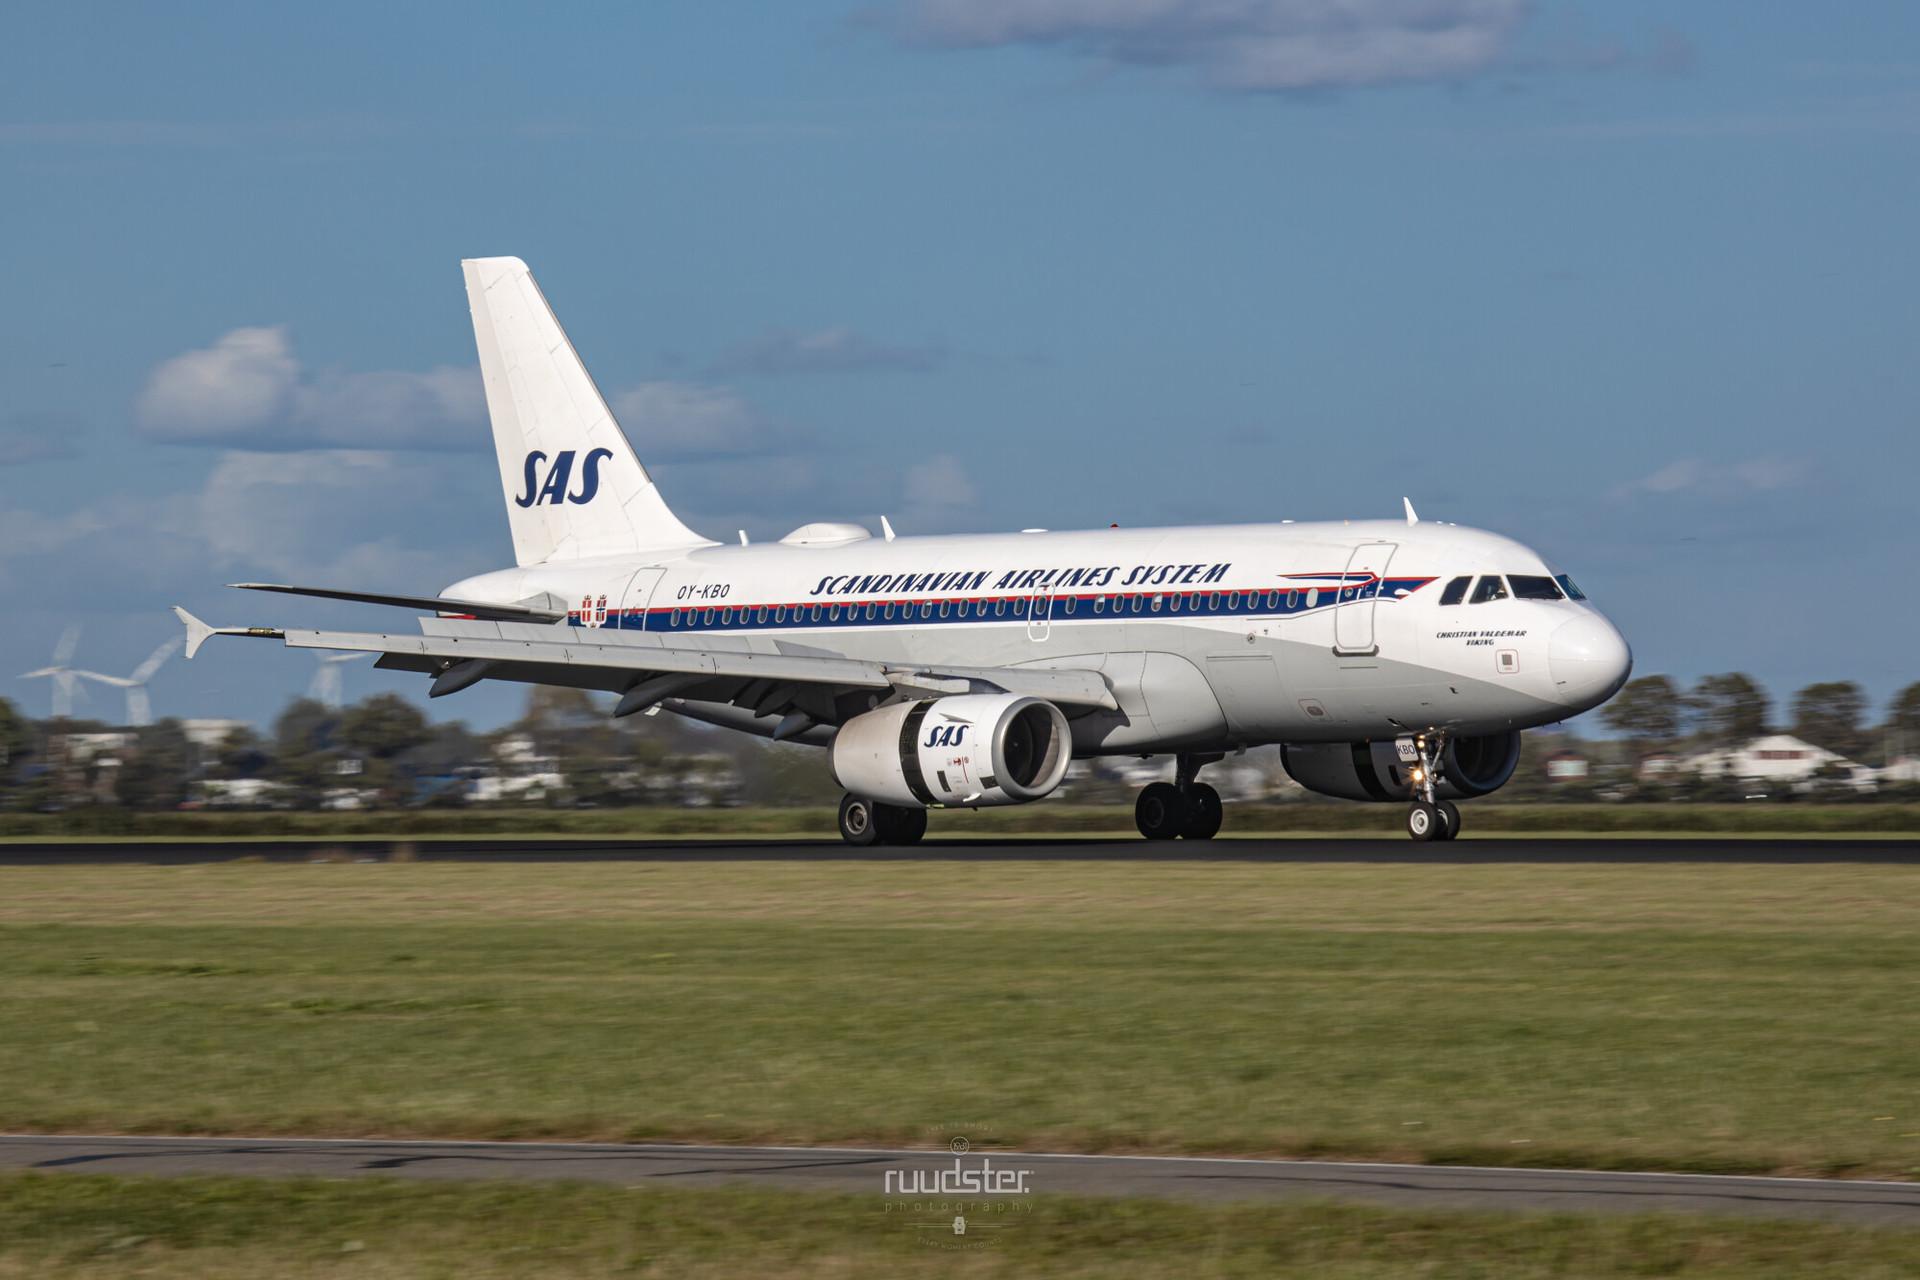 OY-KBO | Build: 2006 - Airbus A319-132